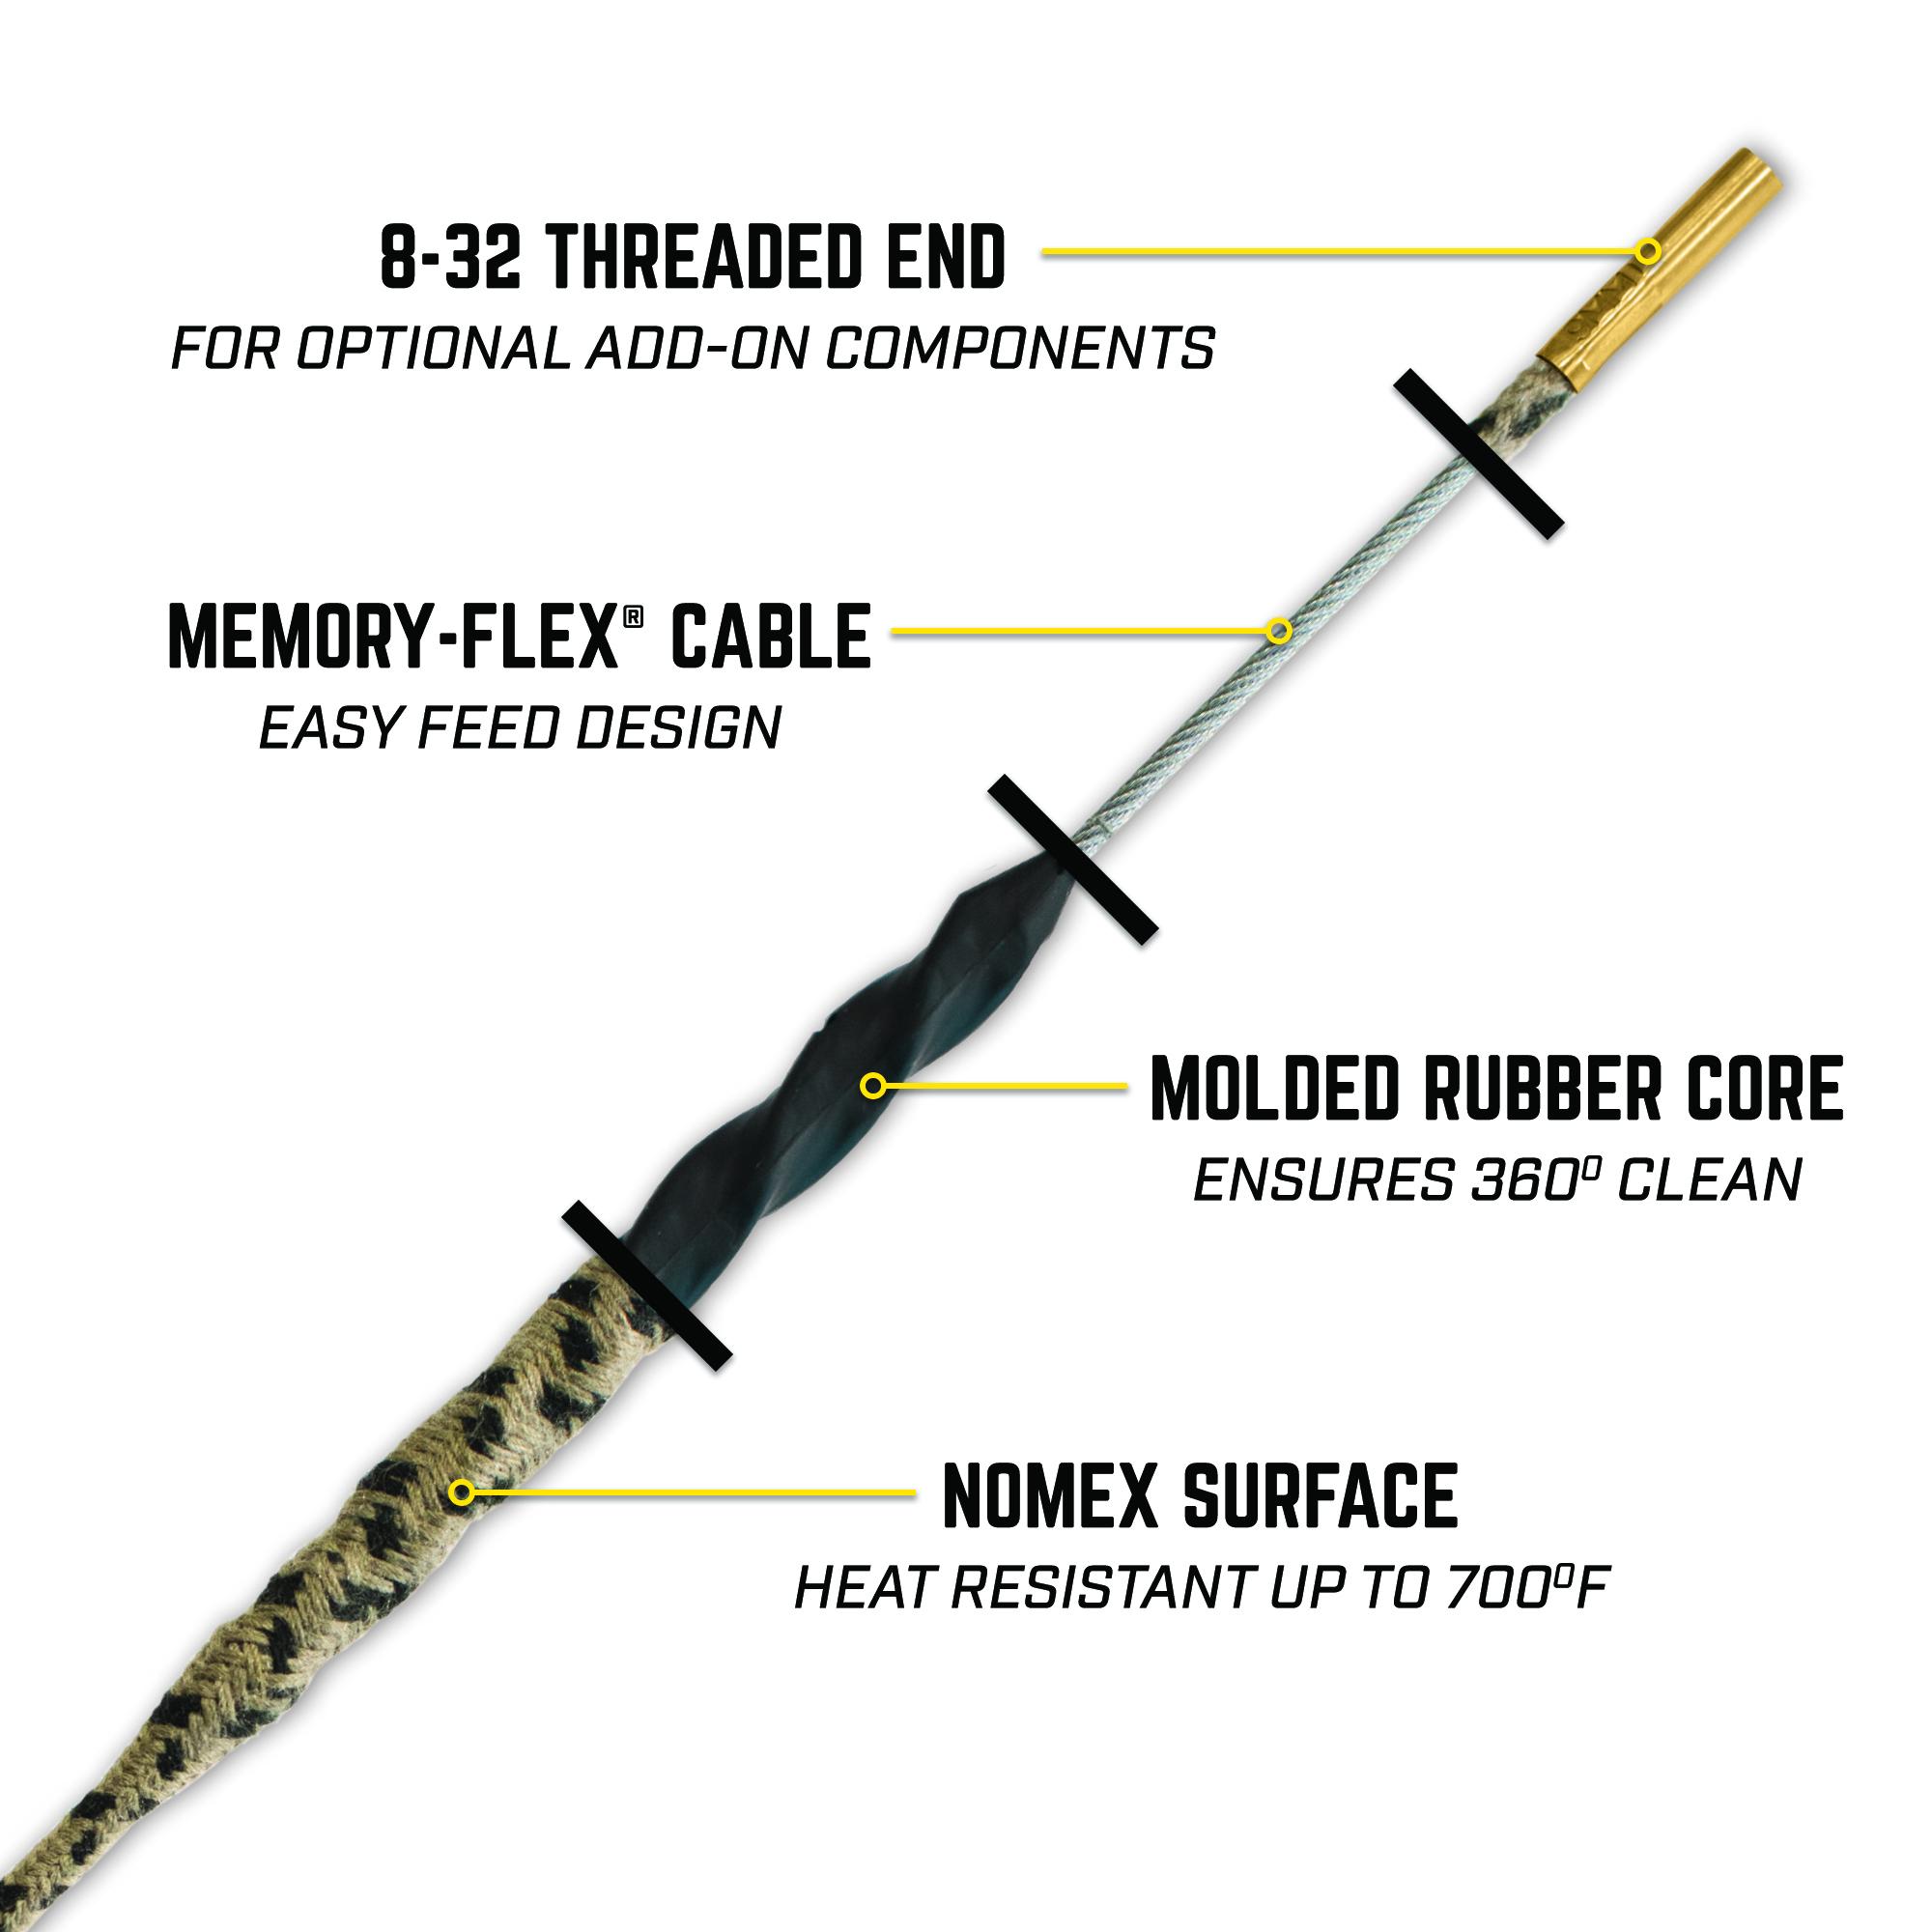 .338 cal Rifle Ripcord®